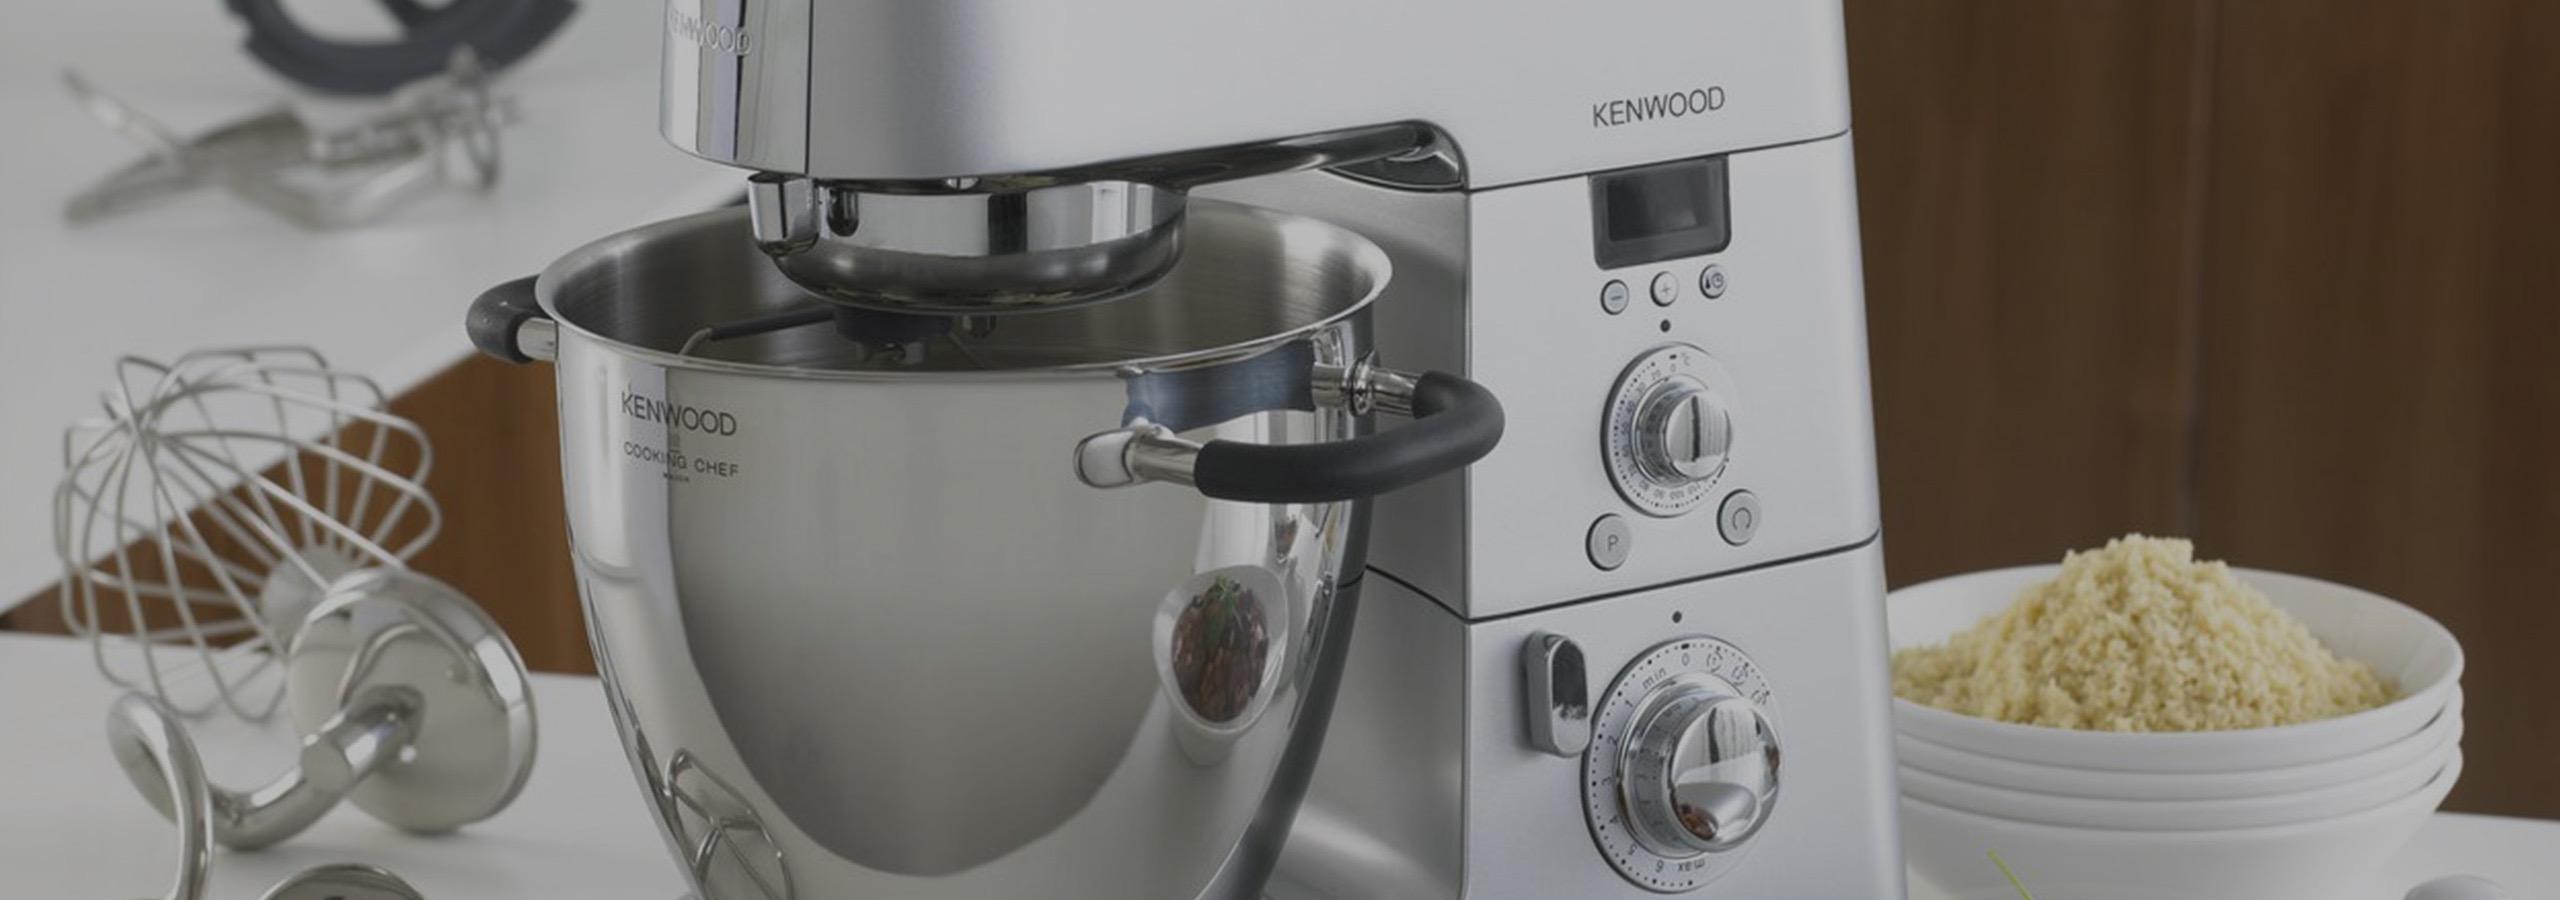 Kenwood-Cooking-Chef